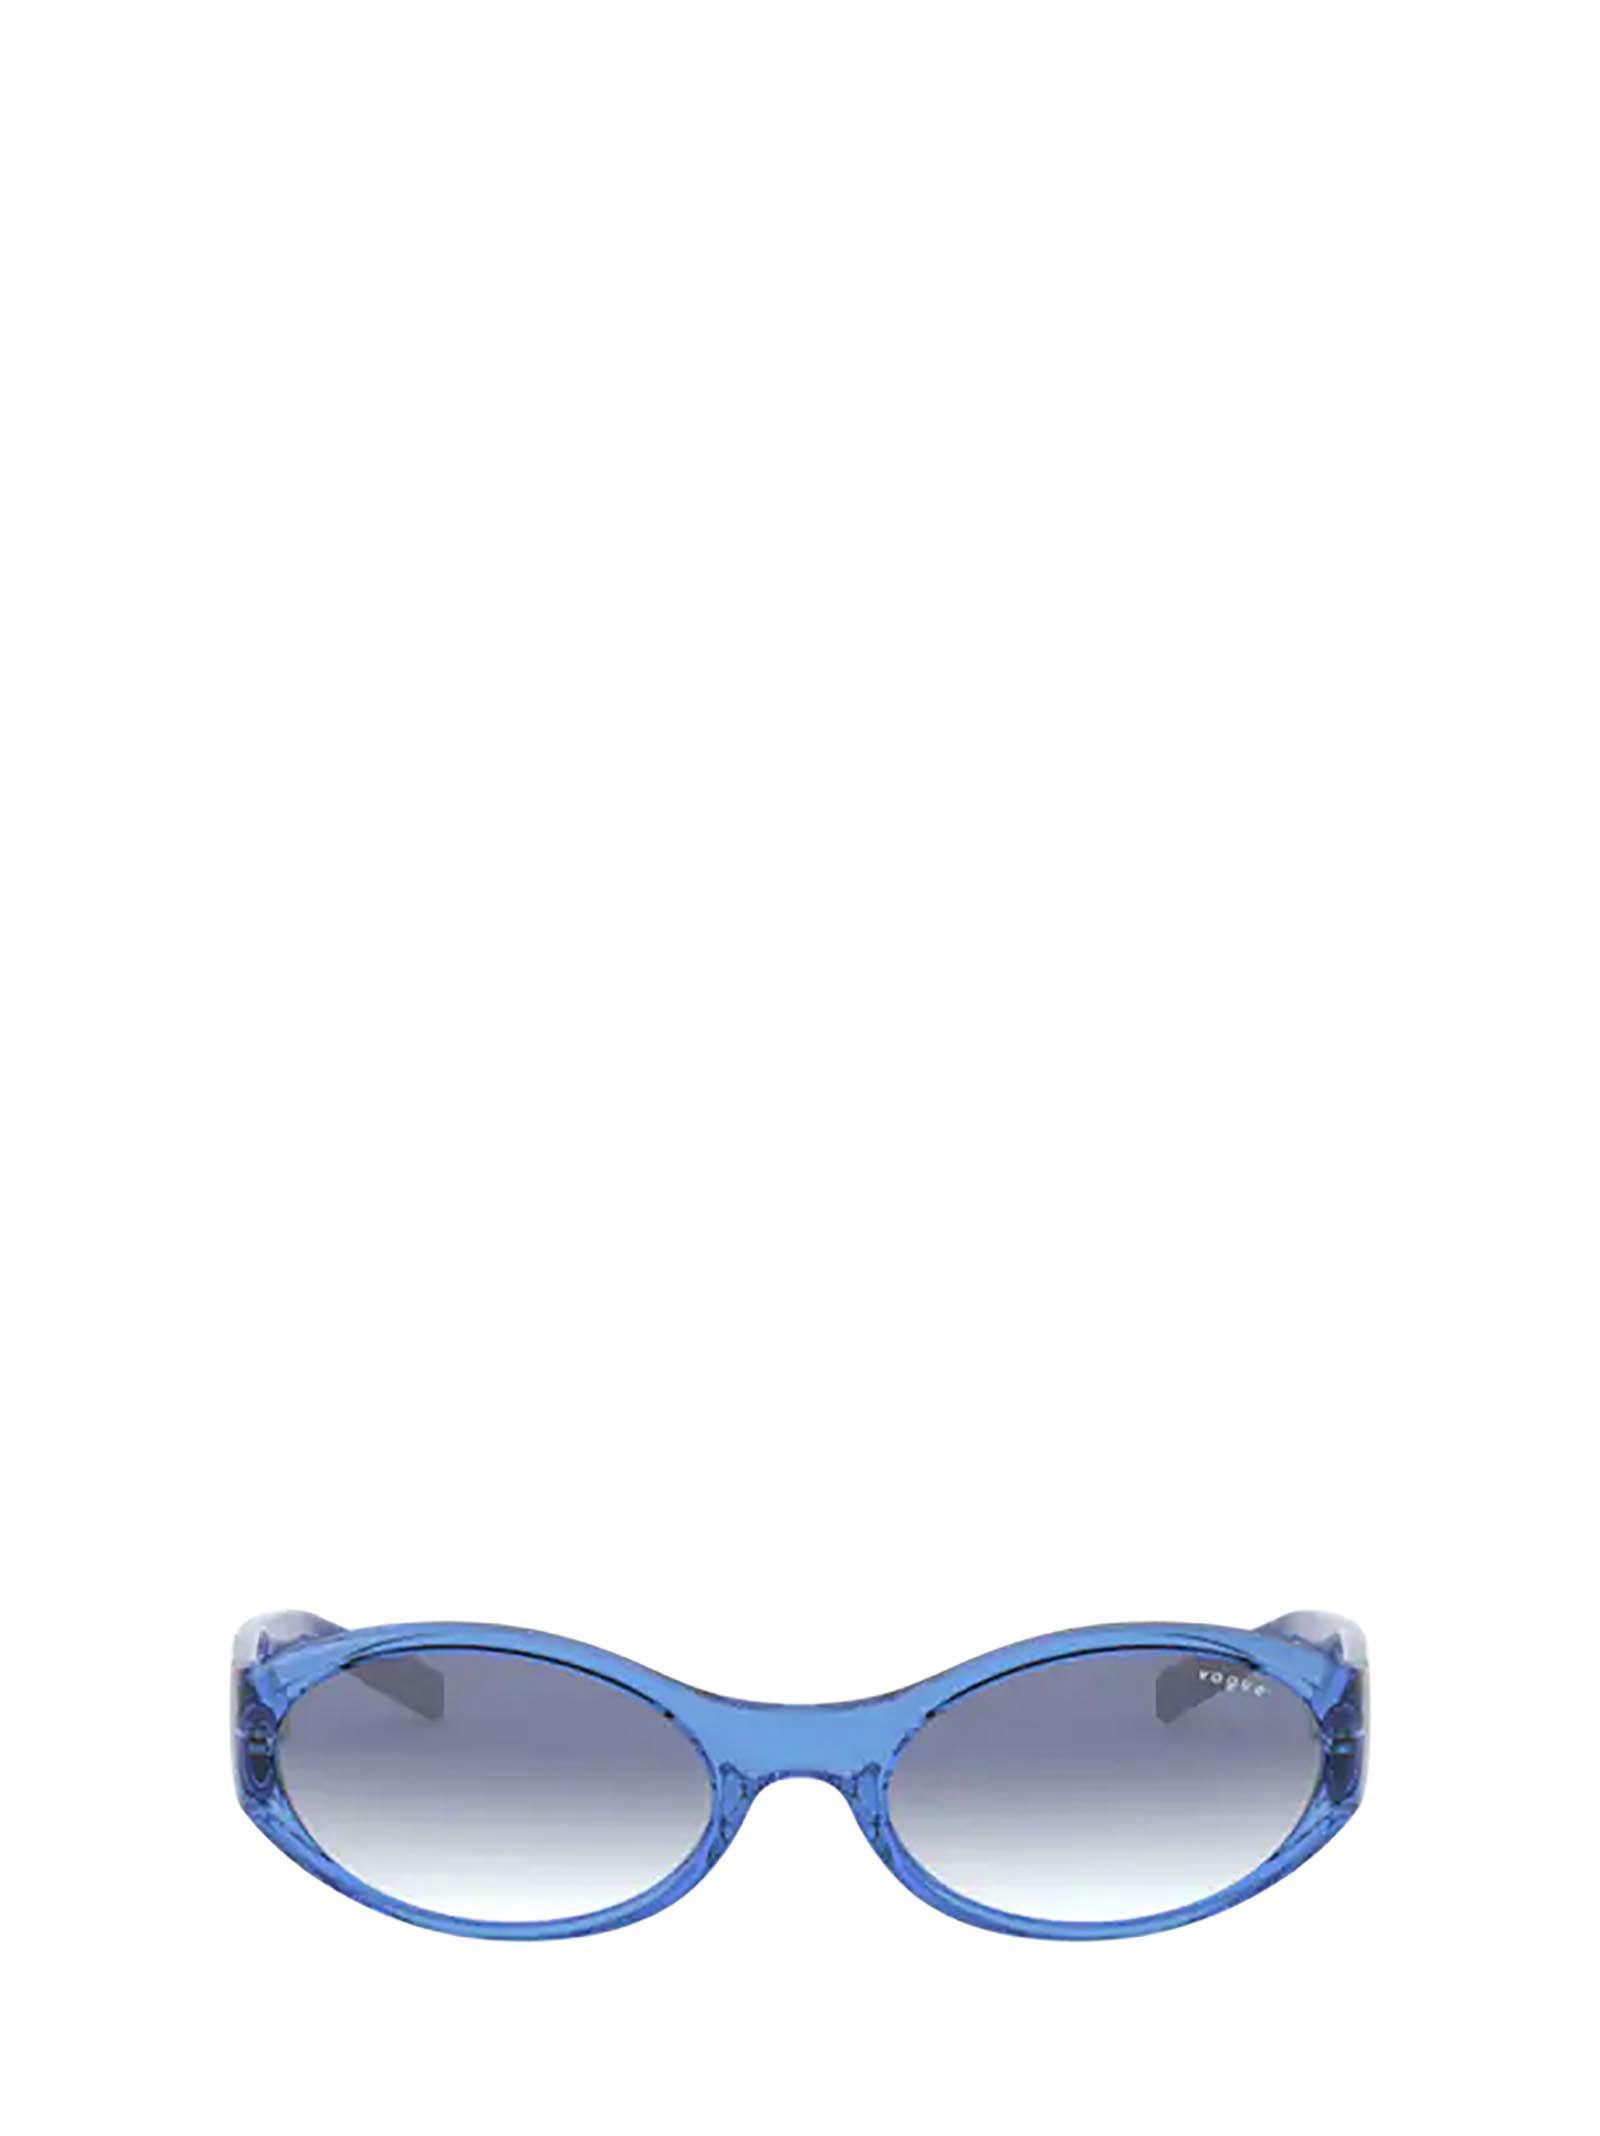 Vogue Eyewear Vogue Vo5315s Transparent Blue Sunglasses